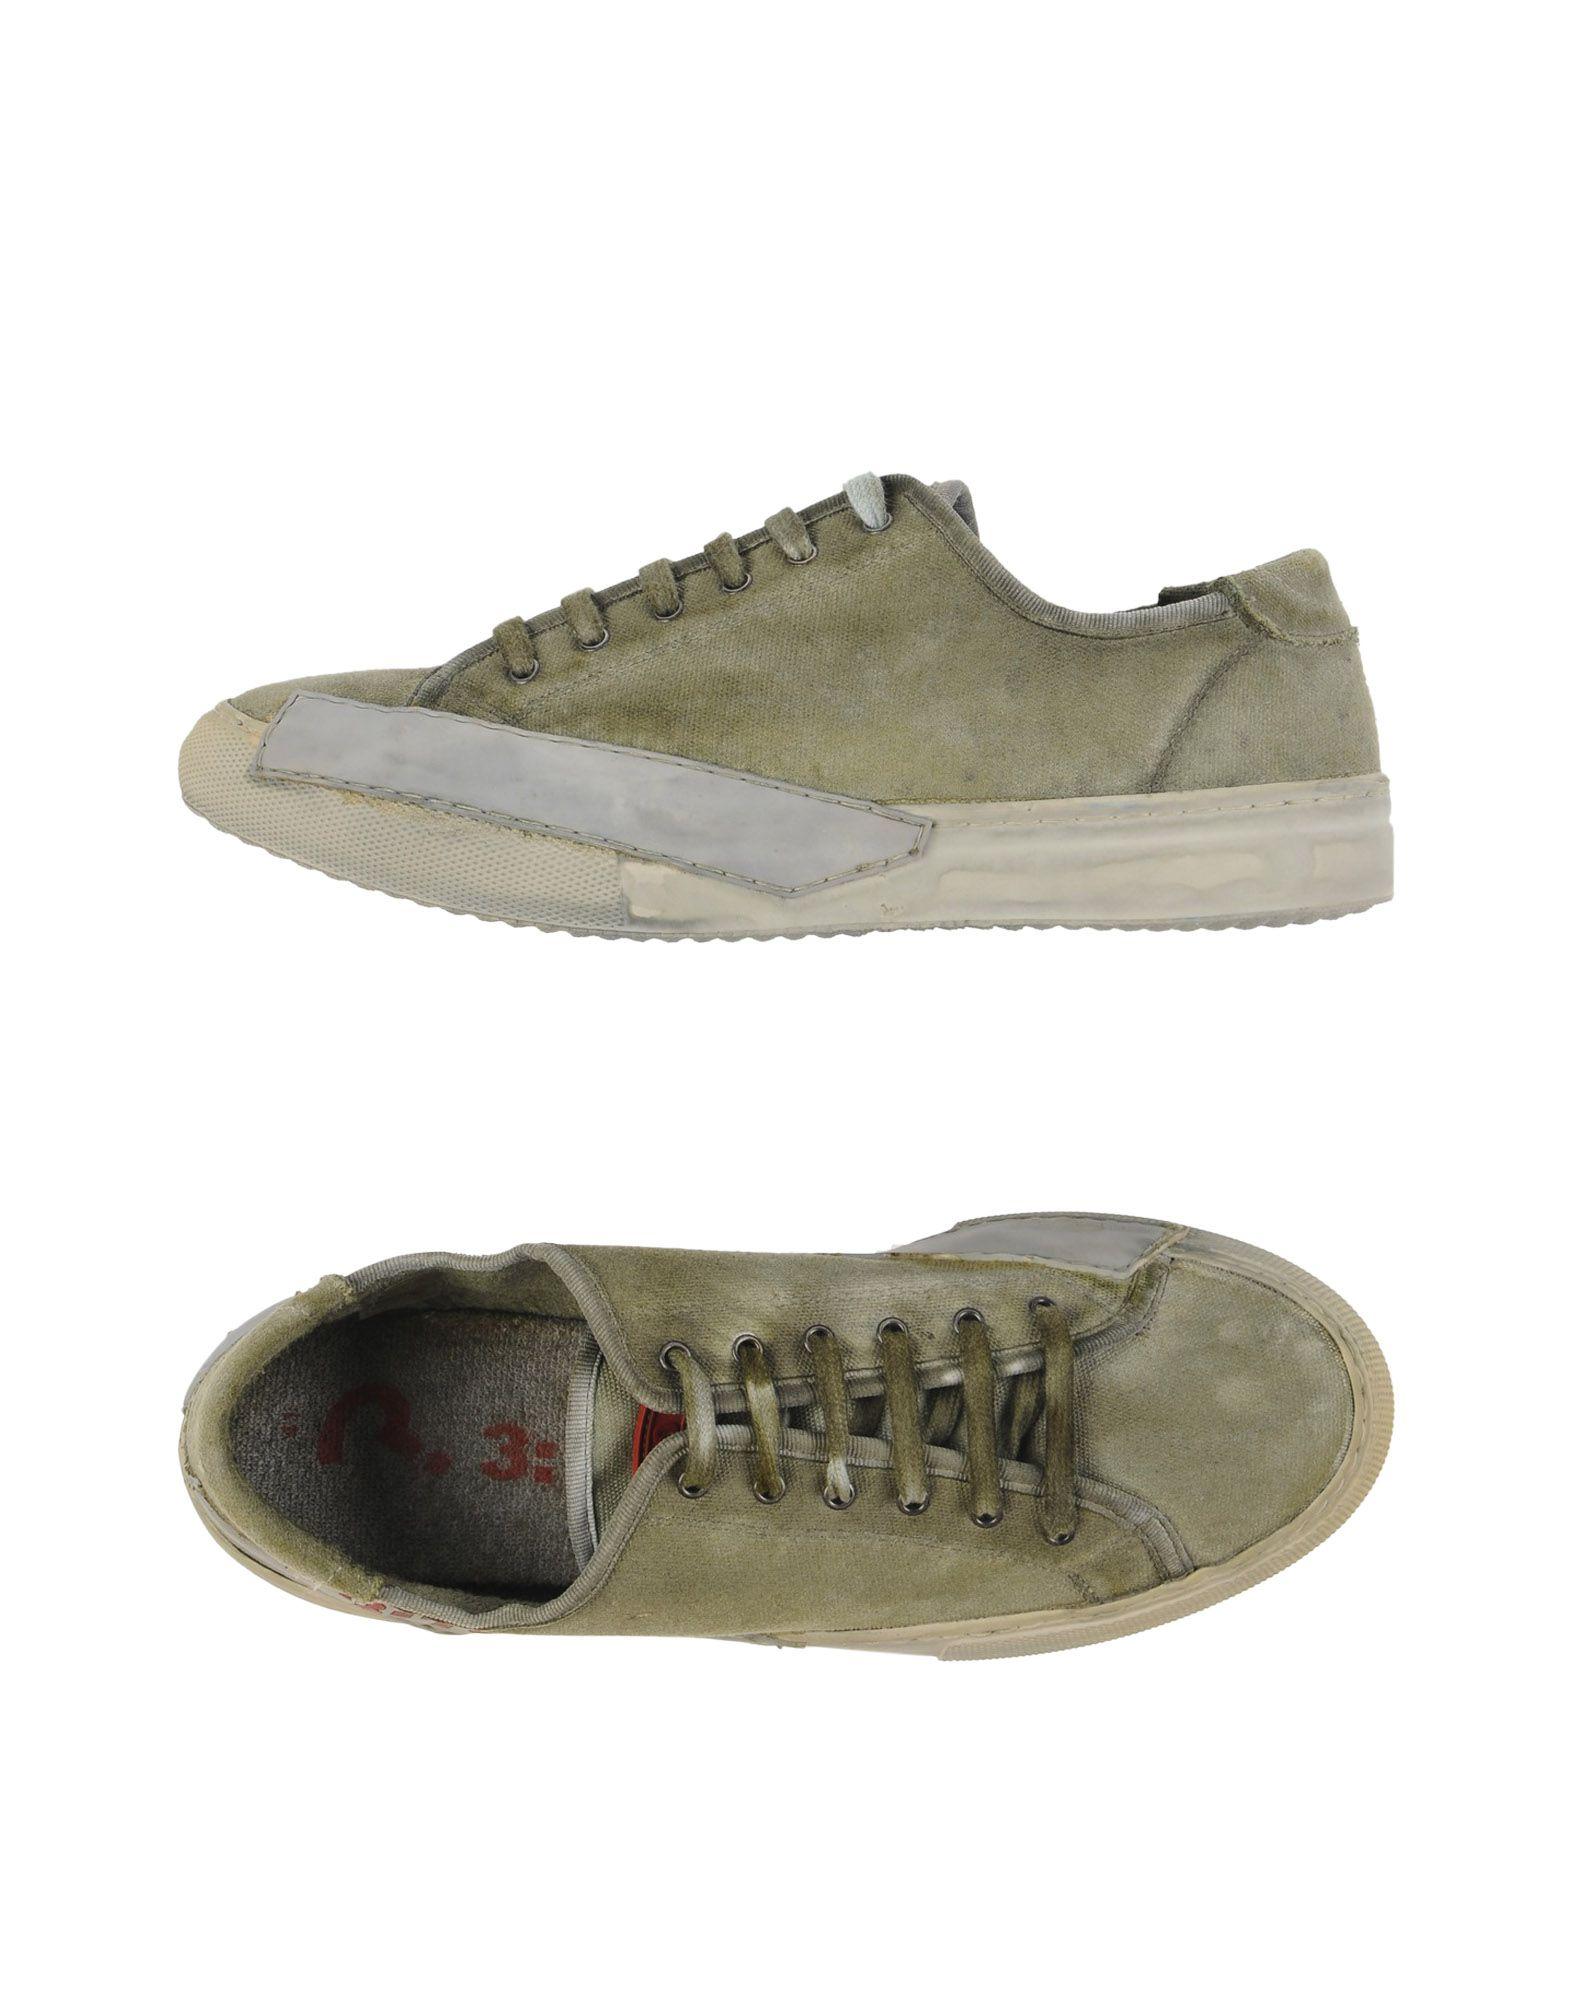 11199435BI 3:10 Sneakers Herren  11199435BI  d934b0